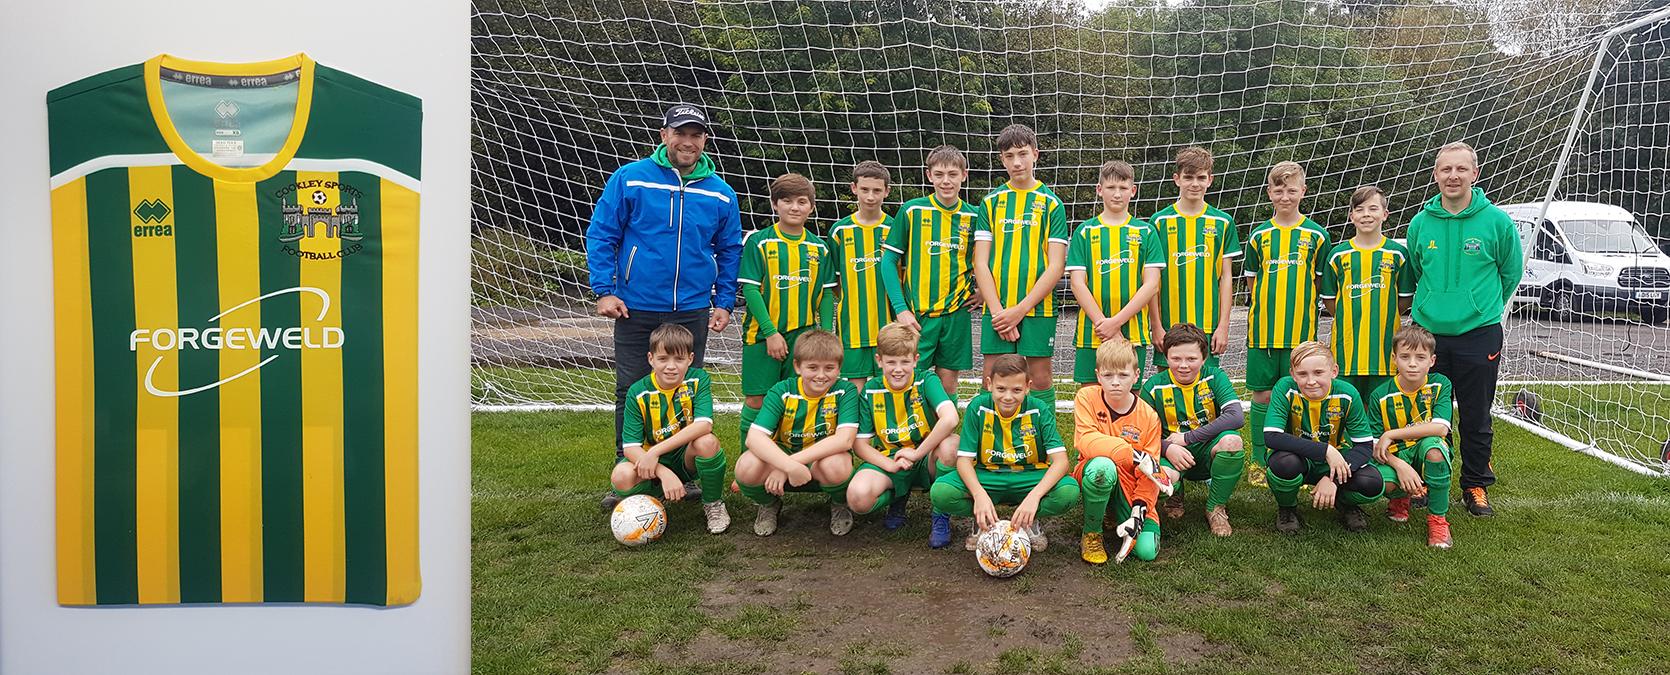 cookley football team